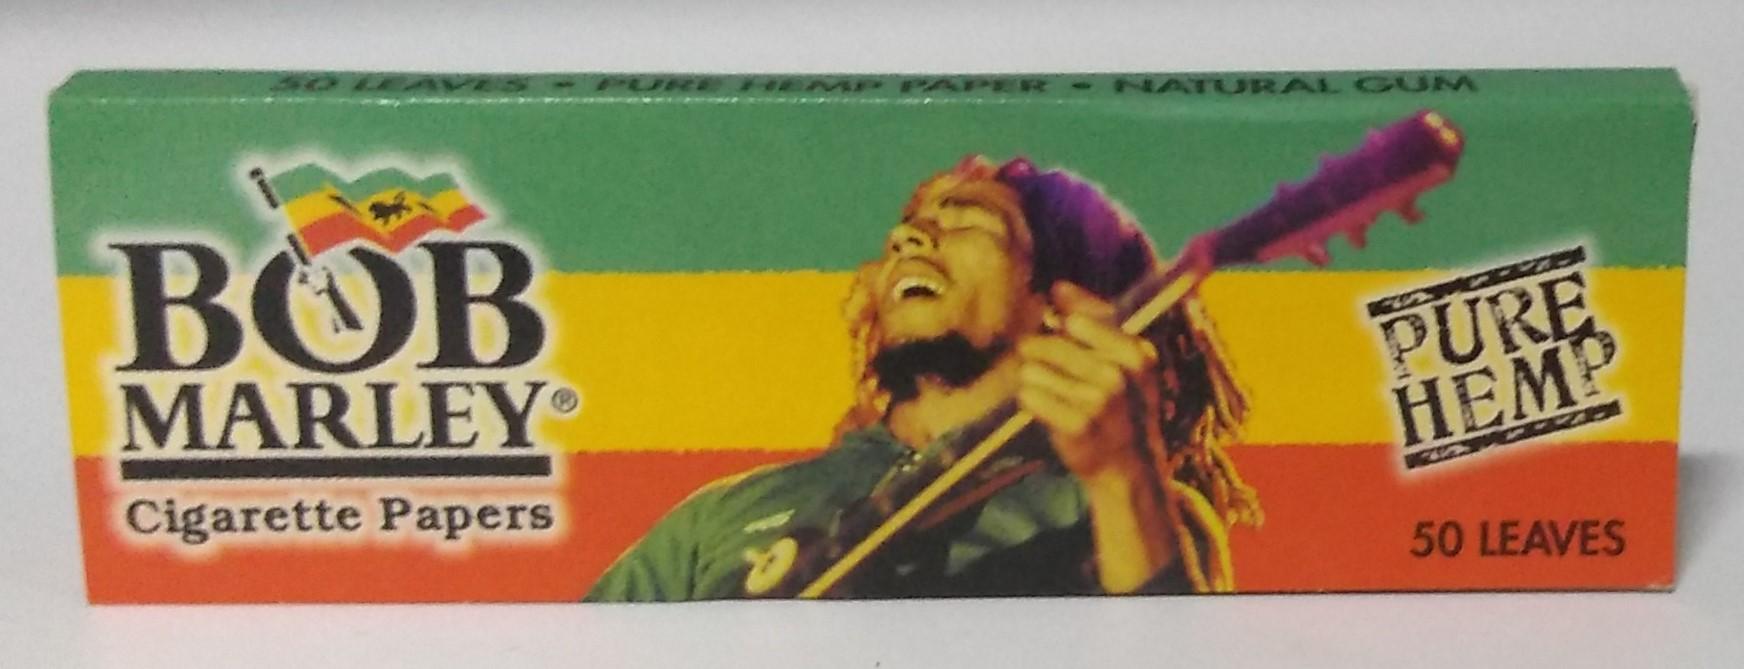 Papel Bob Marley 1.1/4